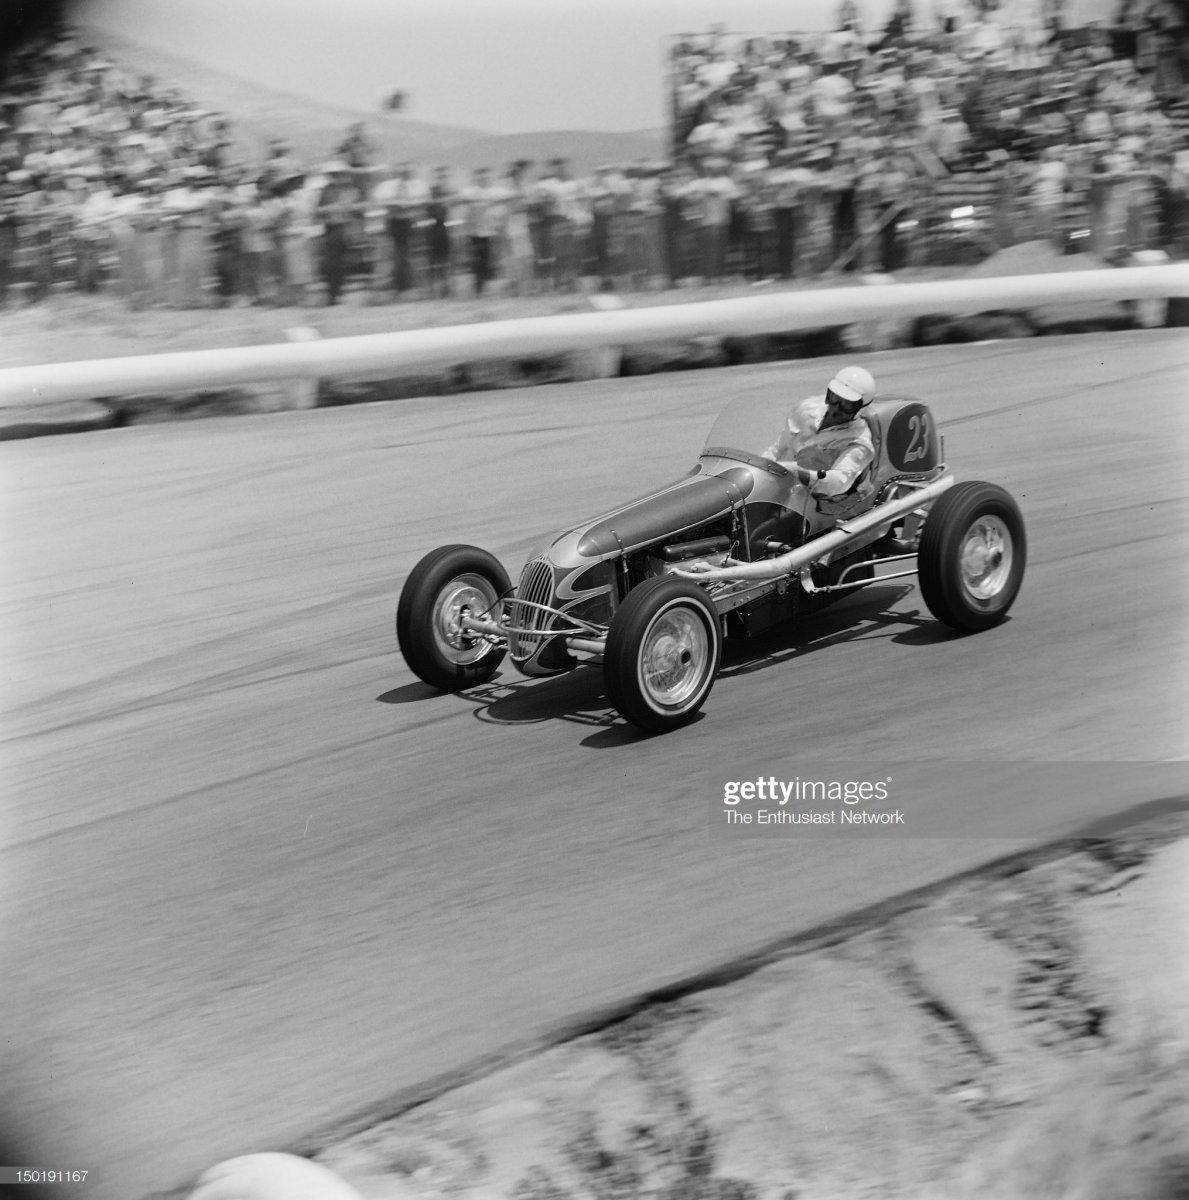 42 1958 California Racing Association 500 -.jpg